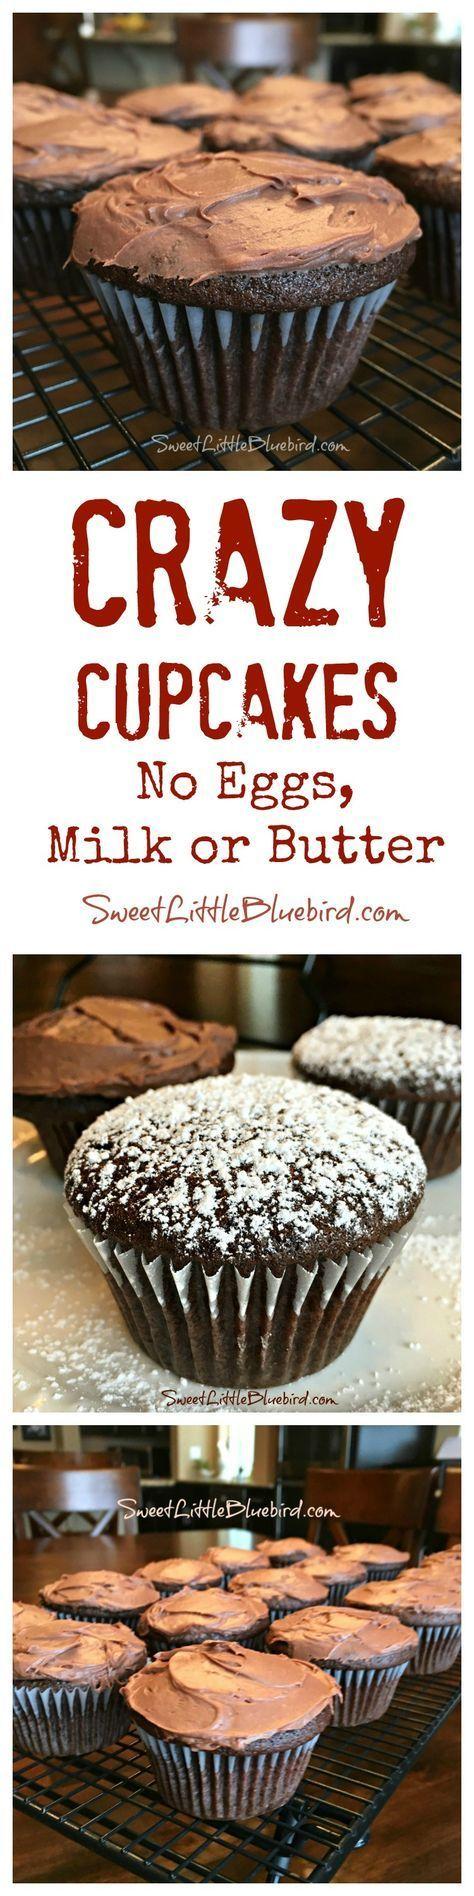 Crazy Cupcakes - No Eggs, Milk Or Butter | Recipes: Cakes ...